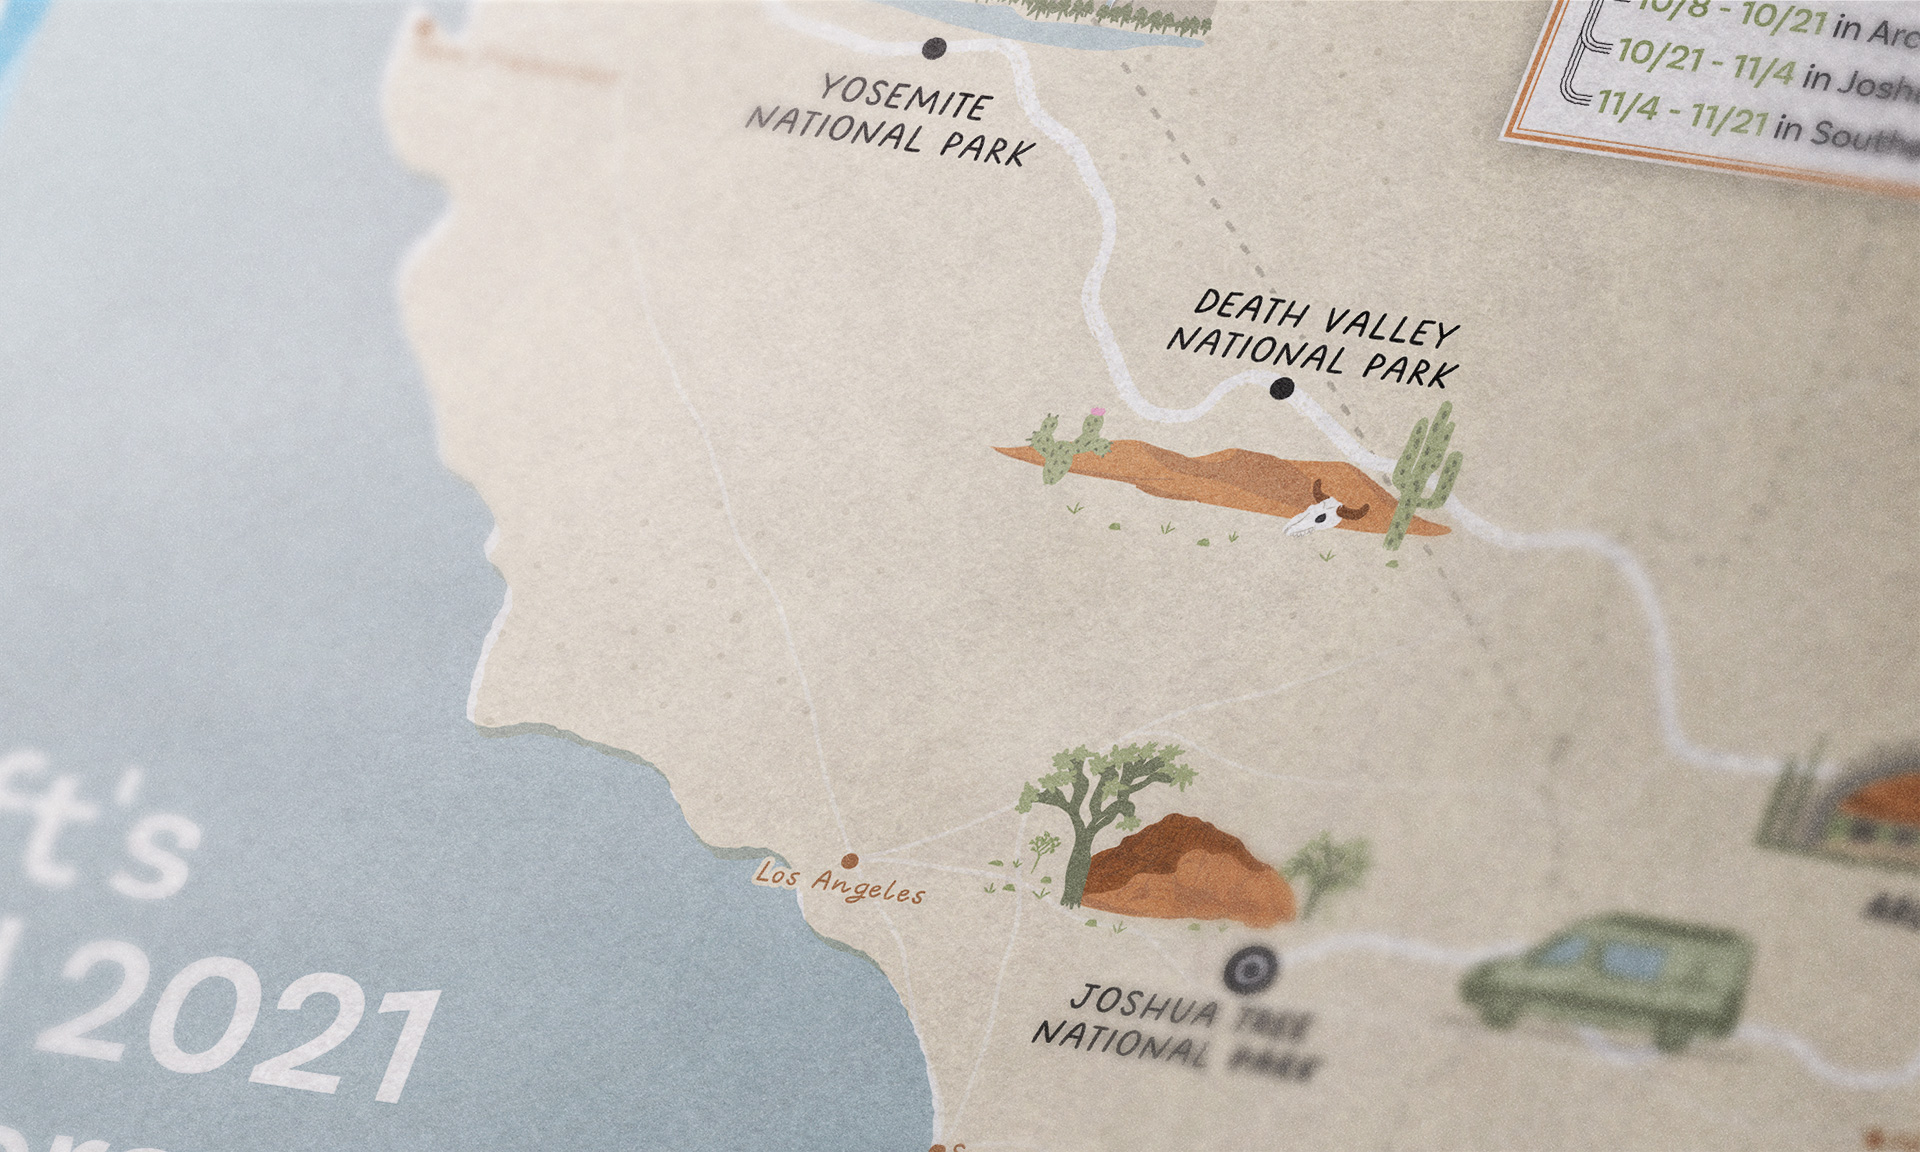 Road trip map close up